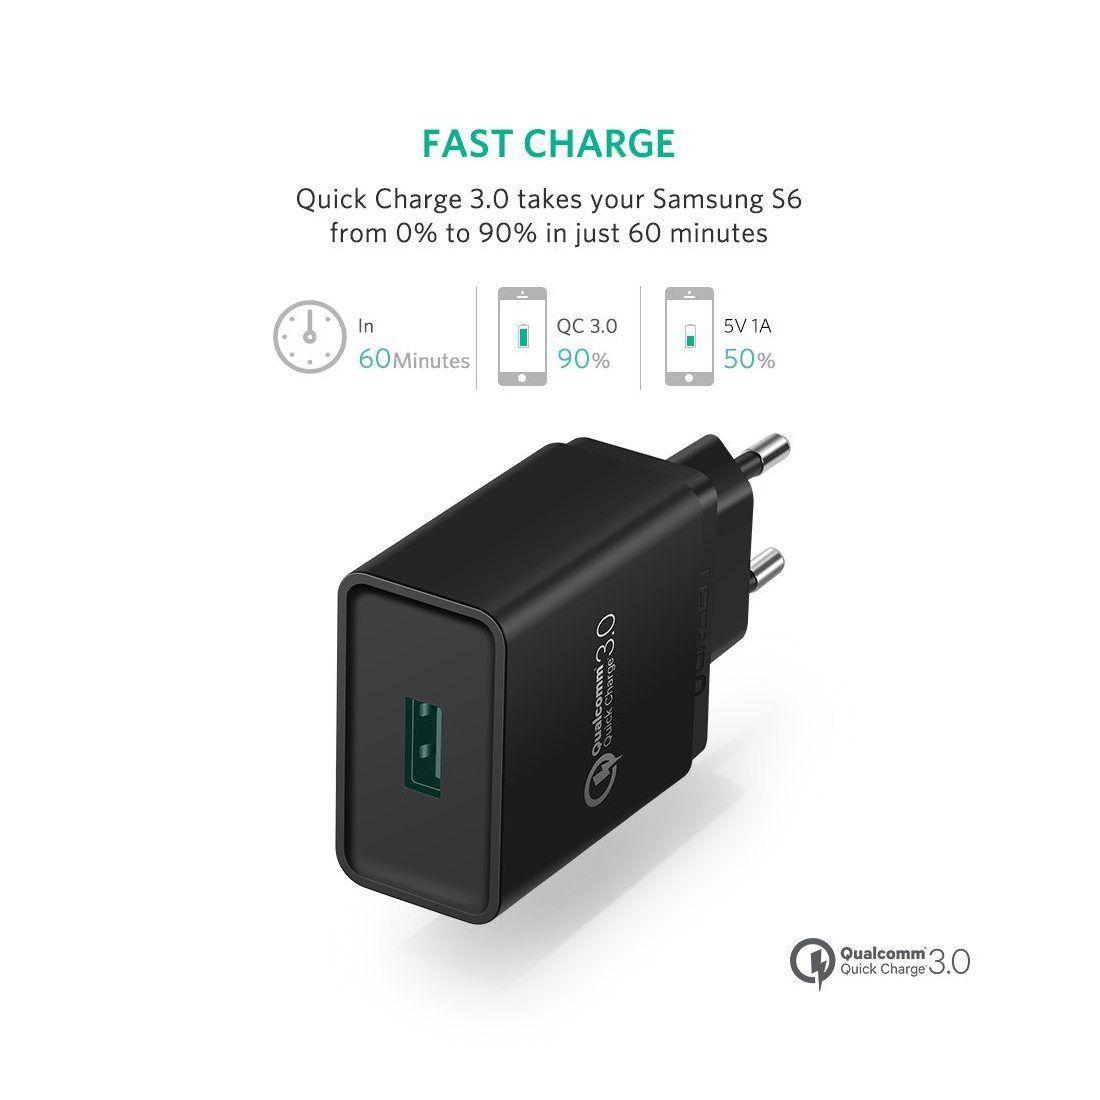 ugreen 18w quick charge 3 0 usb chargeur rapide secteur usb pour iphone x 8 plus samsung galaxy. Black Bedroom Furniture Sets. Home Design Ideas